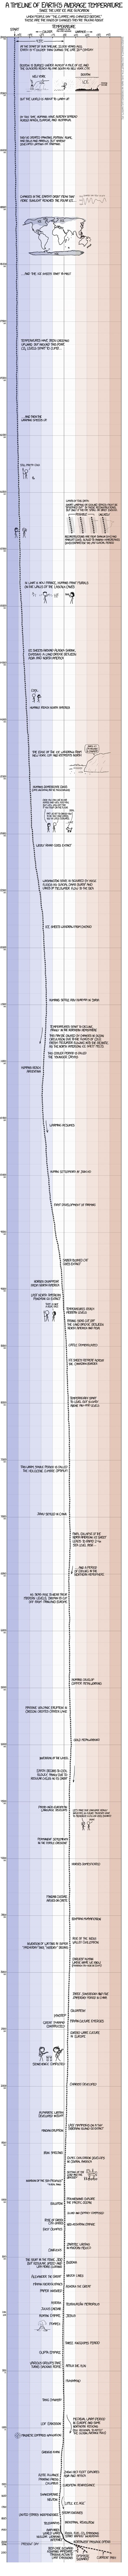 earth_temperature_timeline-4